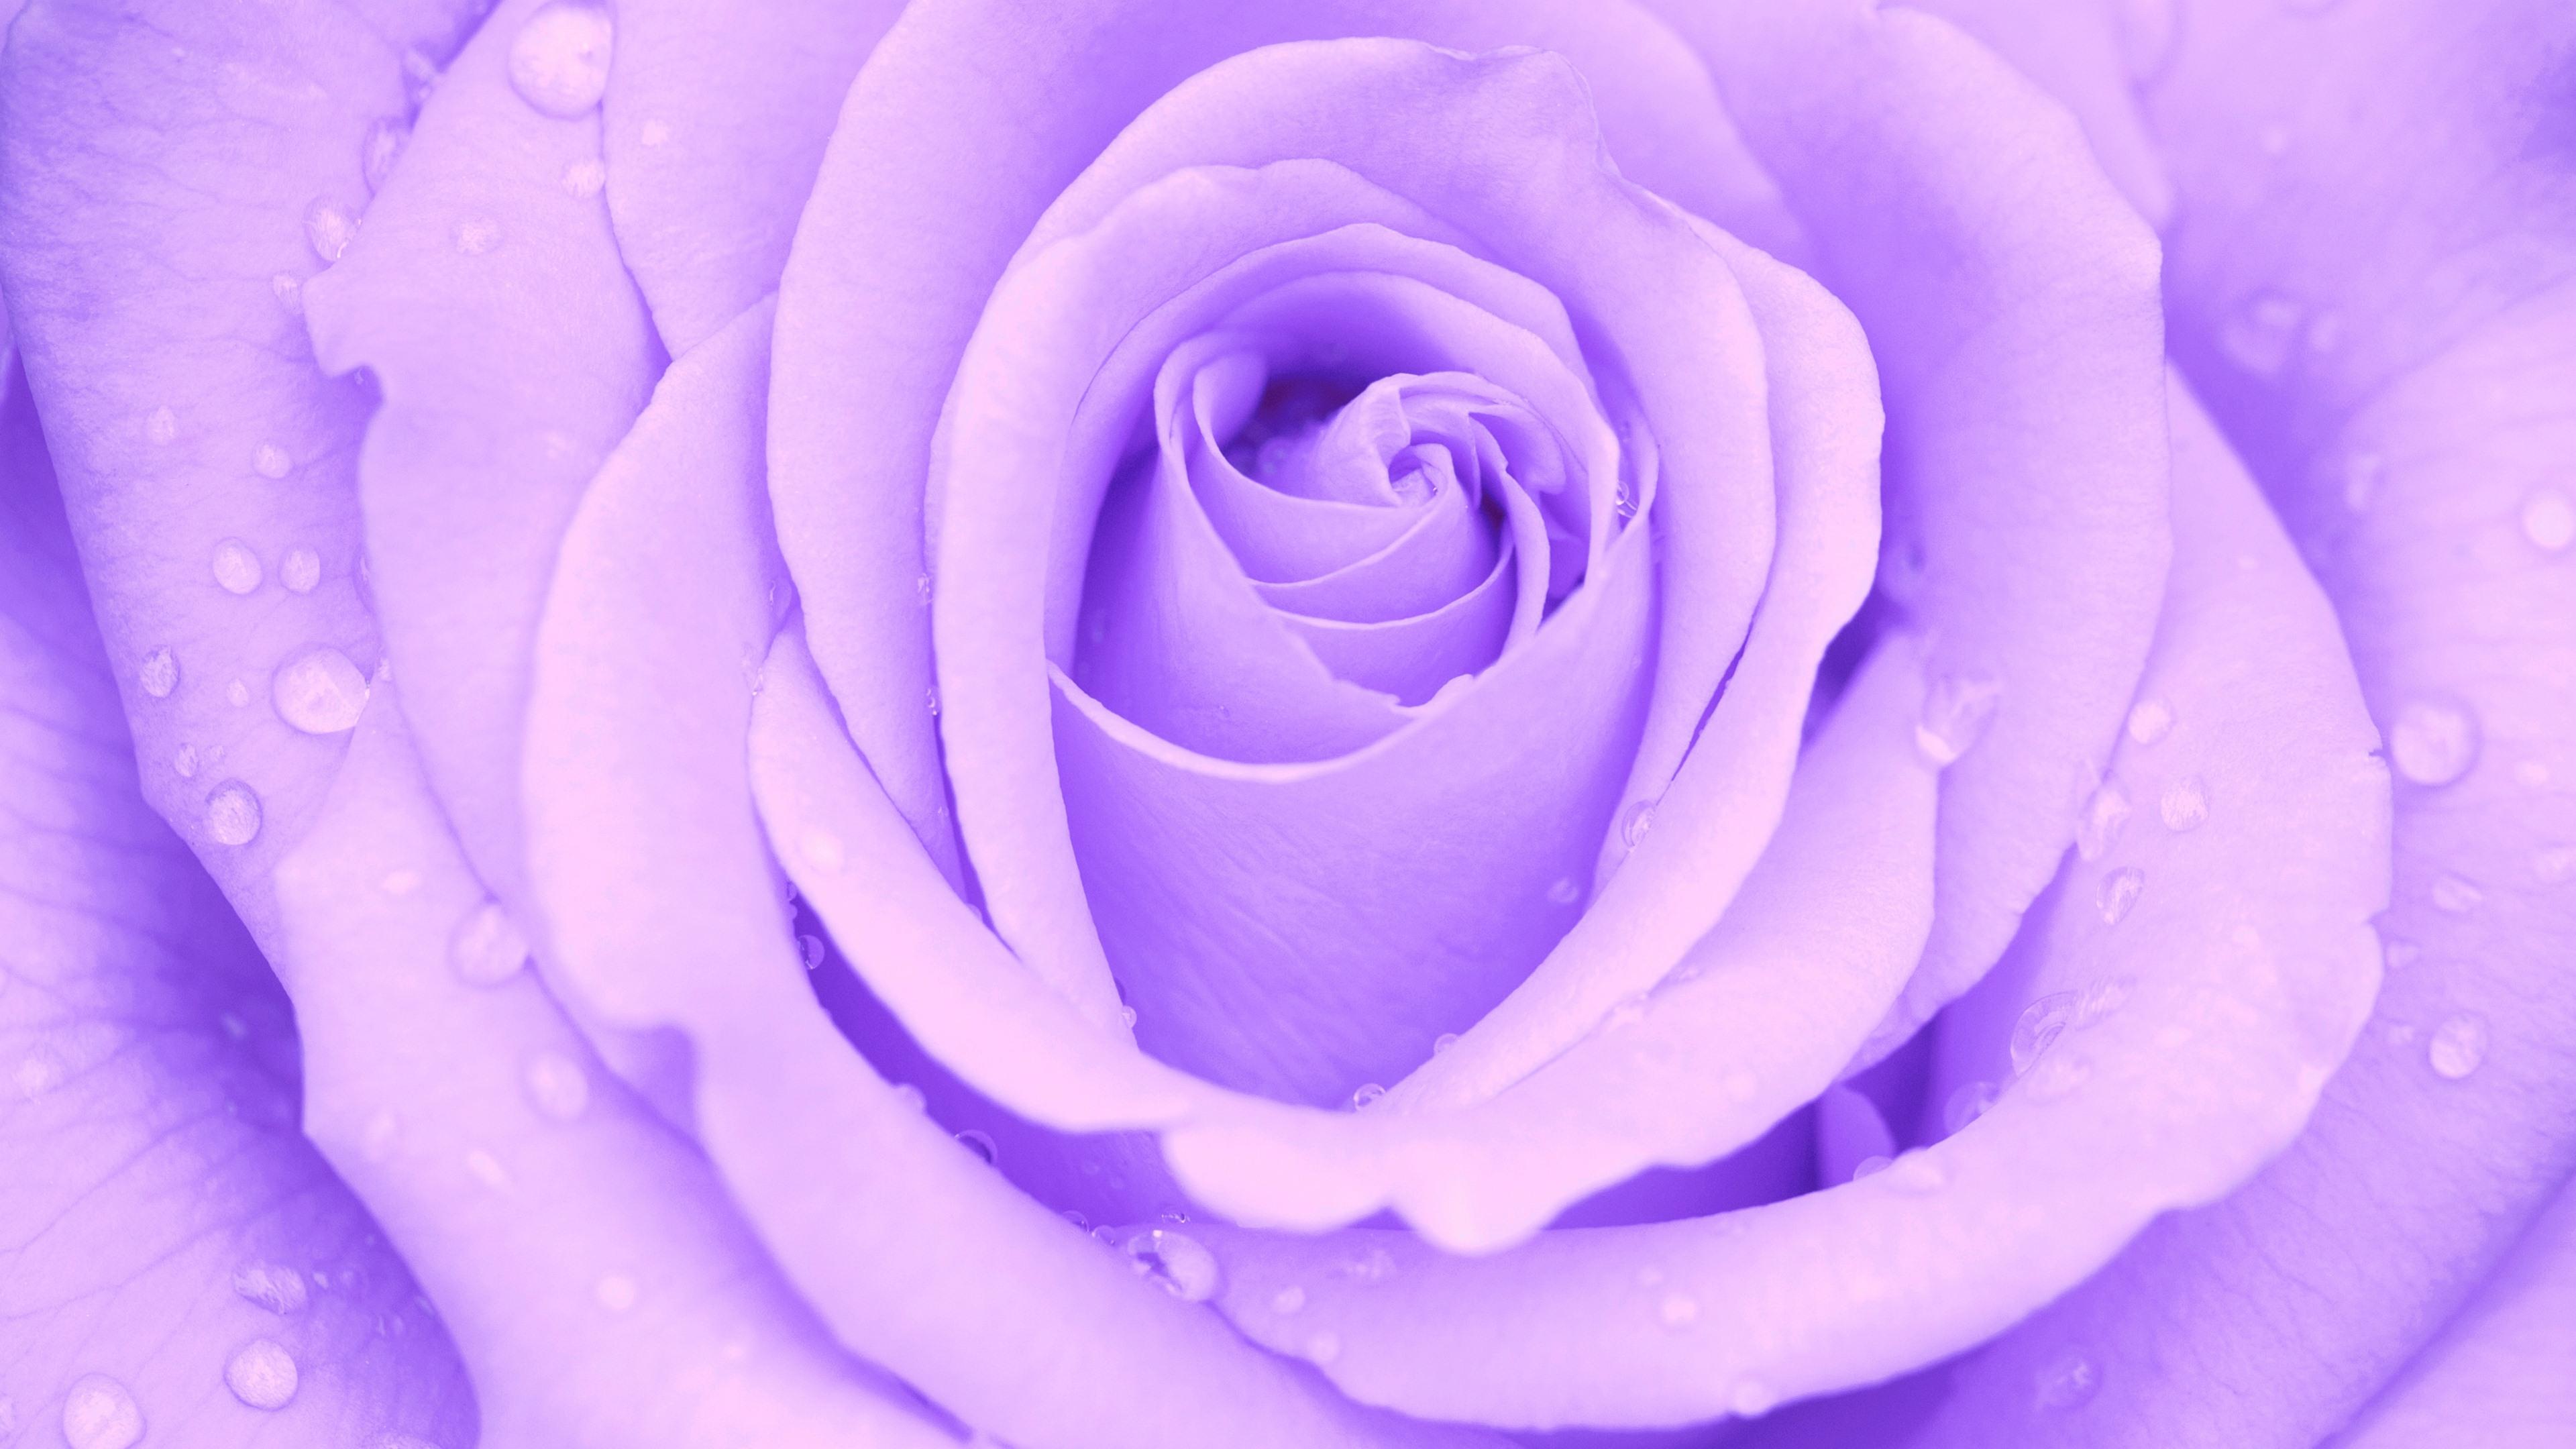 Light Purple Rose 4k Ultra Hd Wallpaper Background Image